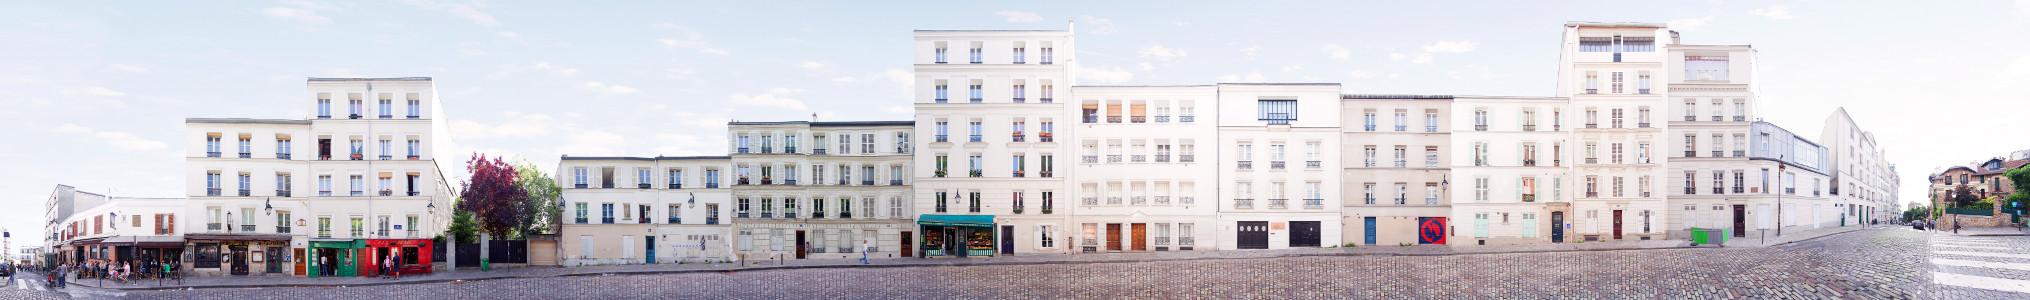 Rue Gabrielle • Paris • France